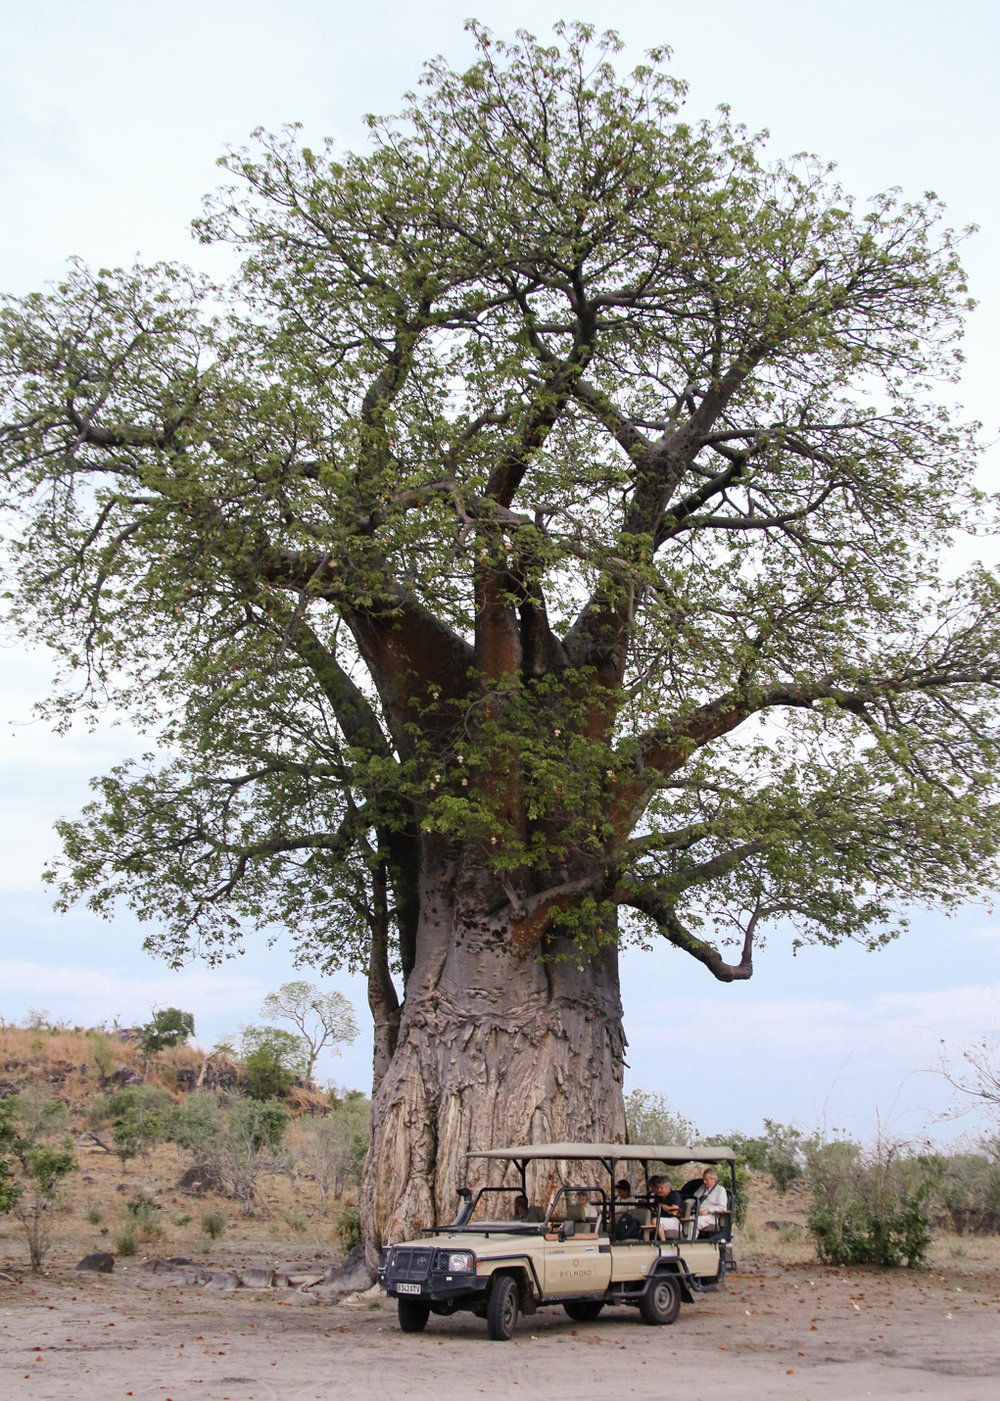 Africa - LindsayBrown -WEB-4011.jpg